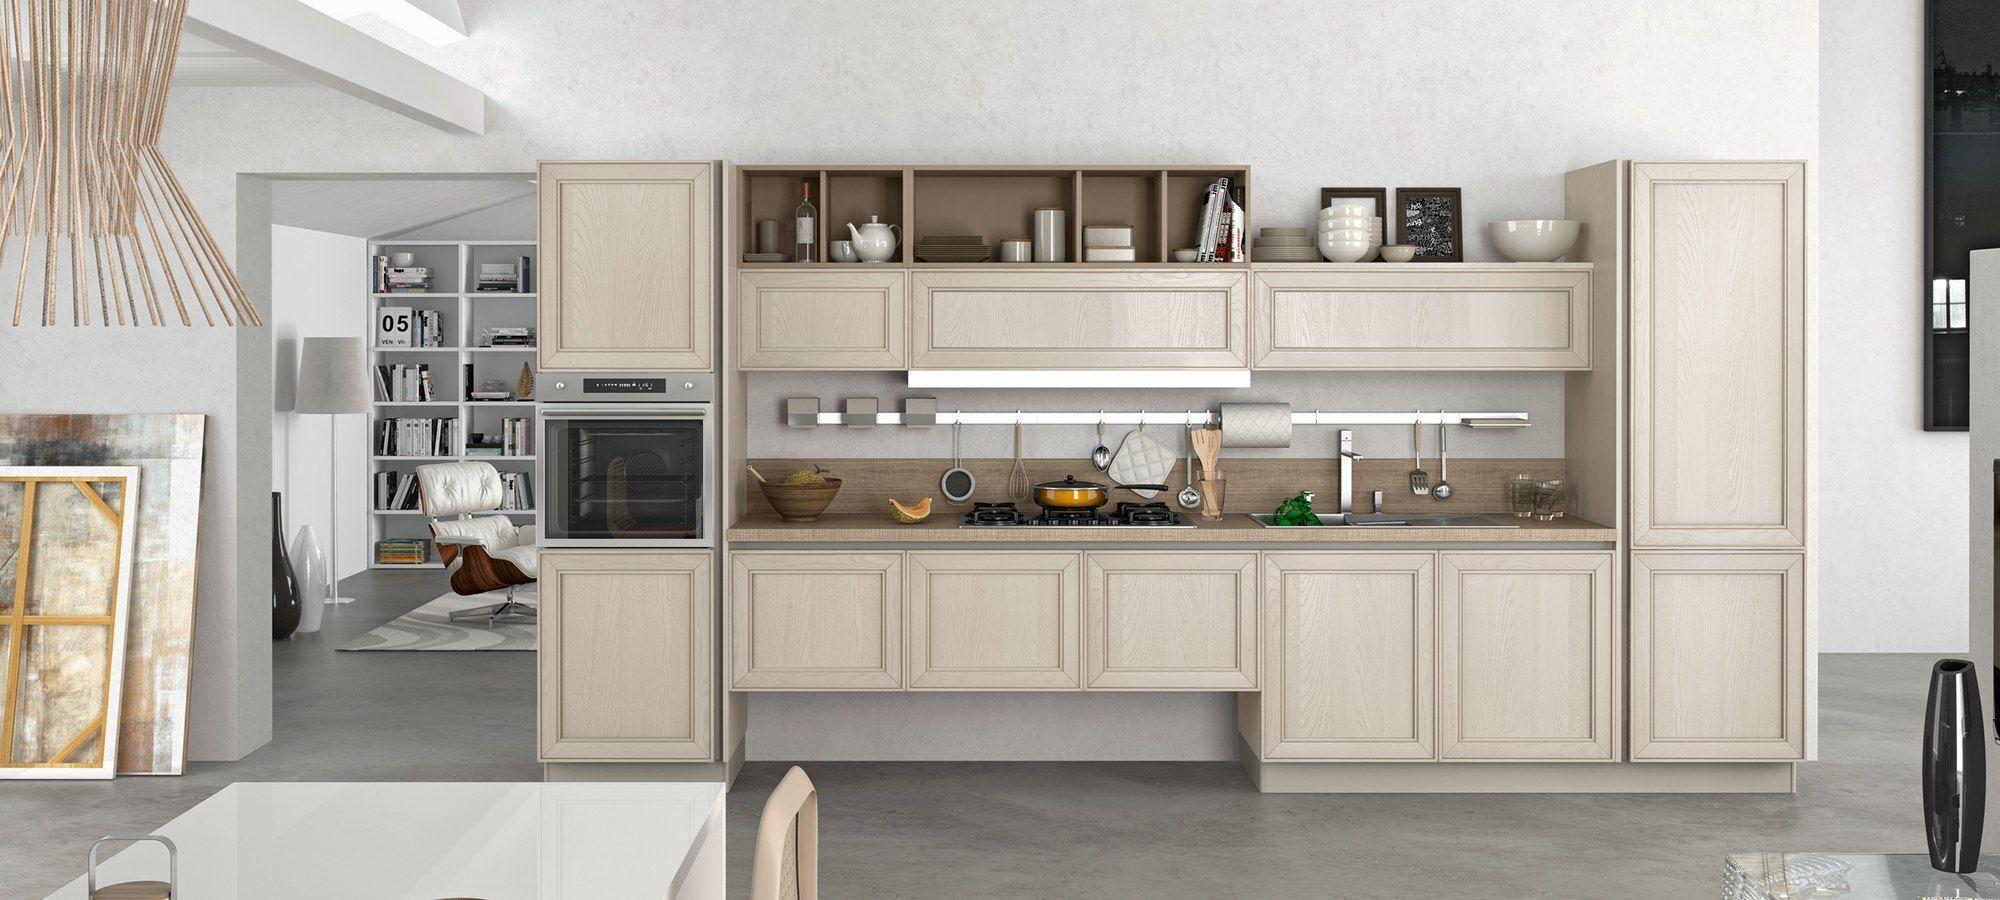 cucine contemporanee stosa - modello cucina maxim 02 | Дизайн кухонь ...